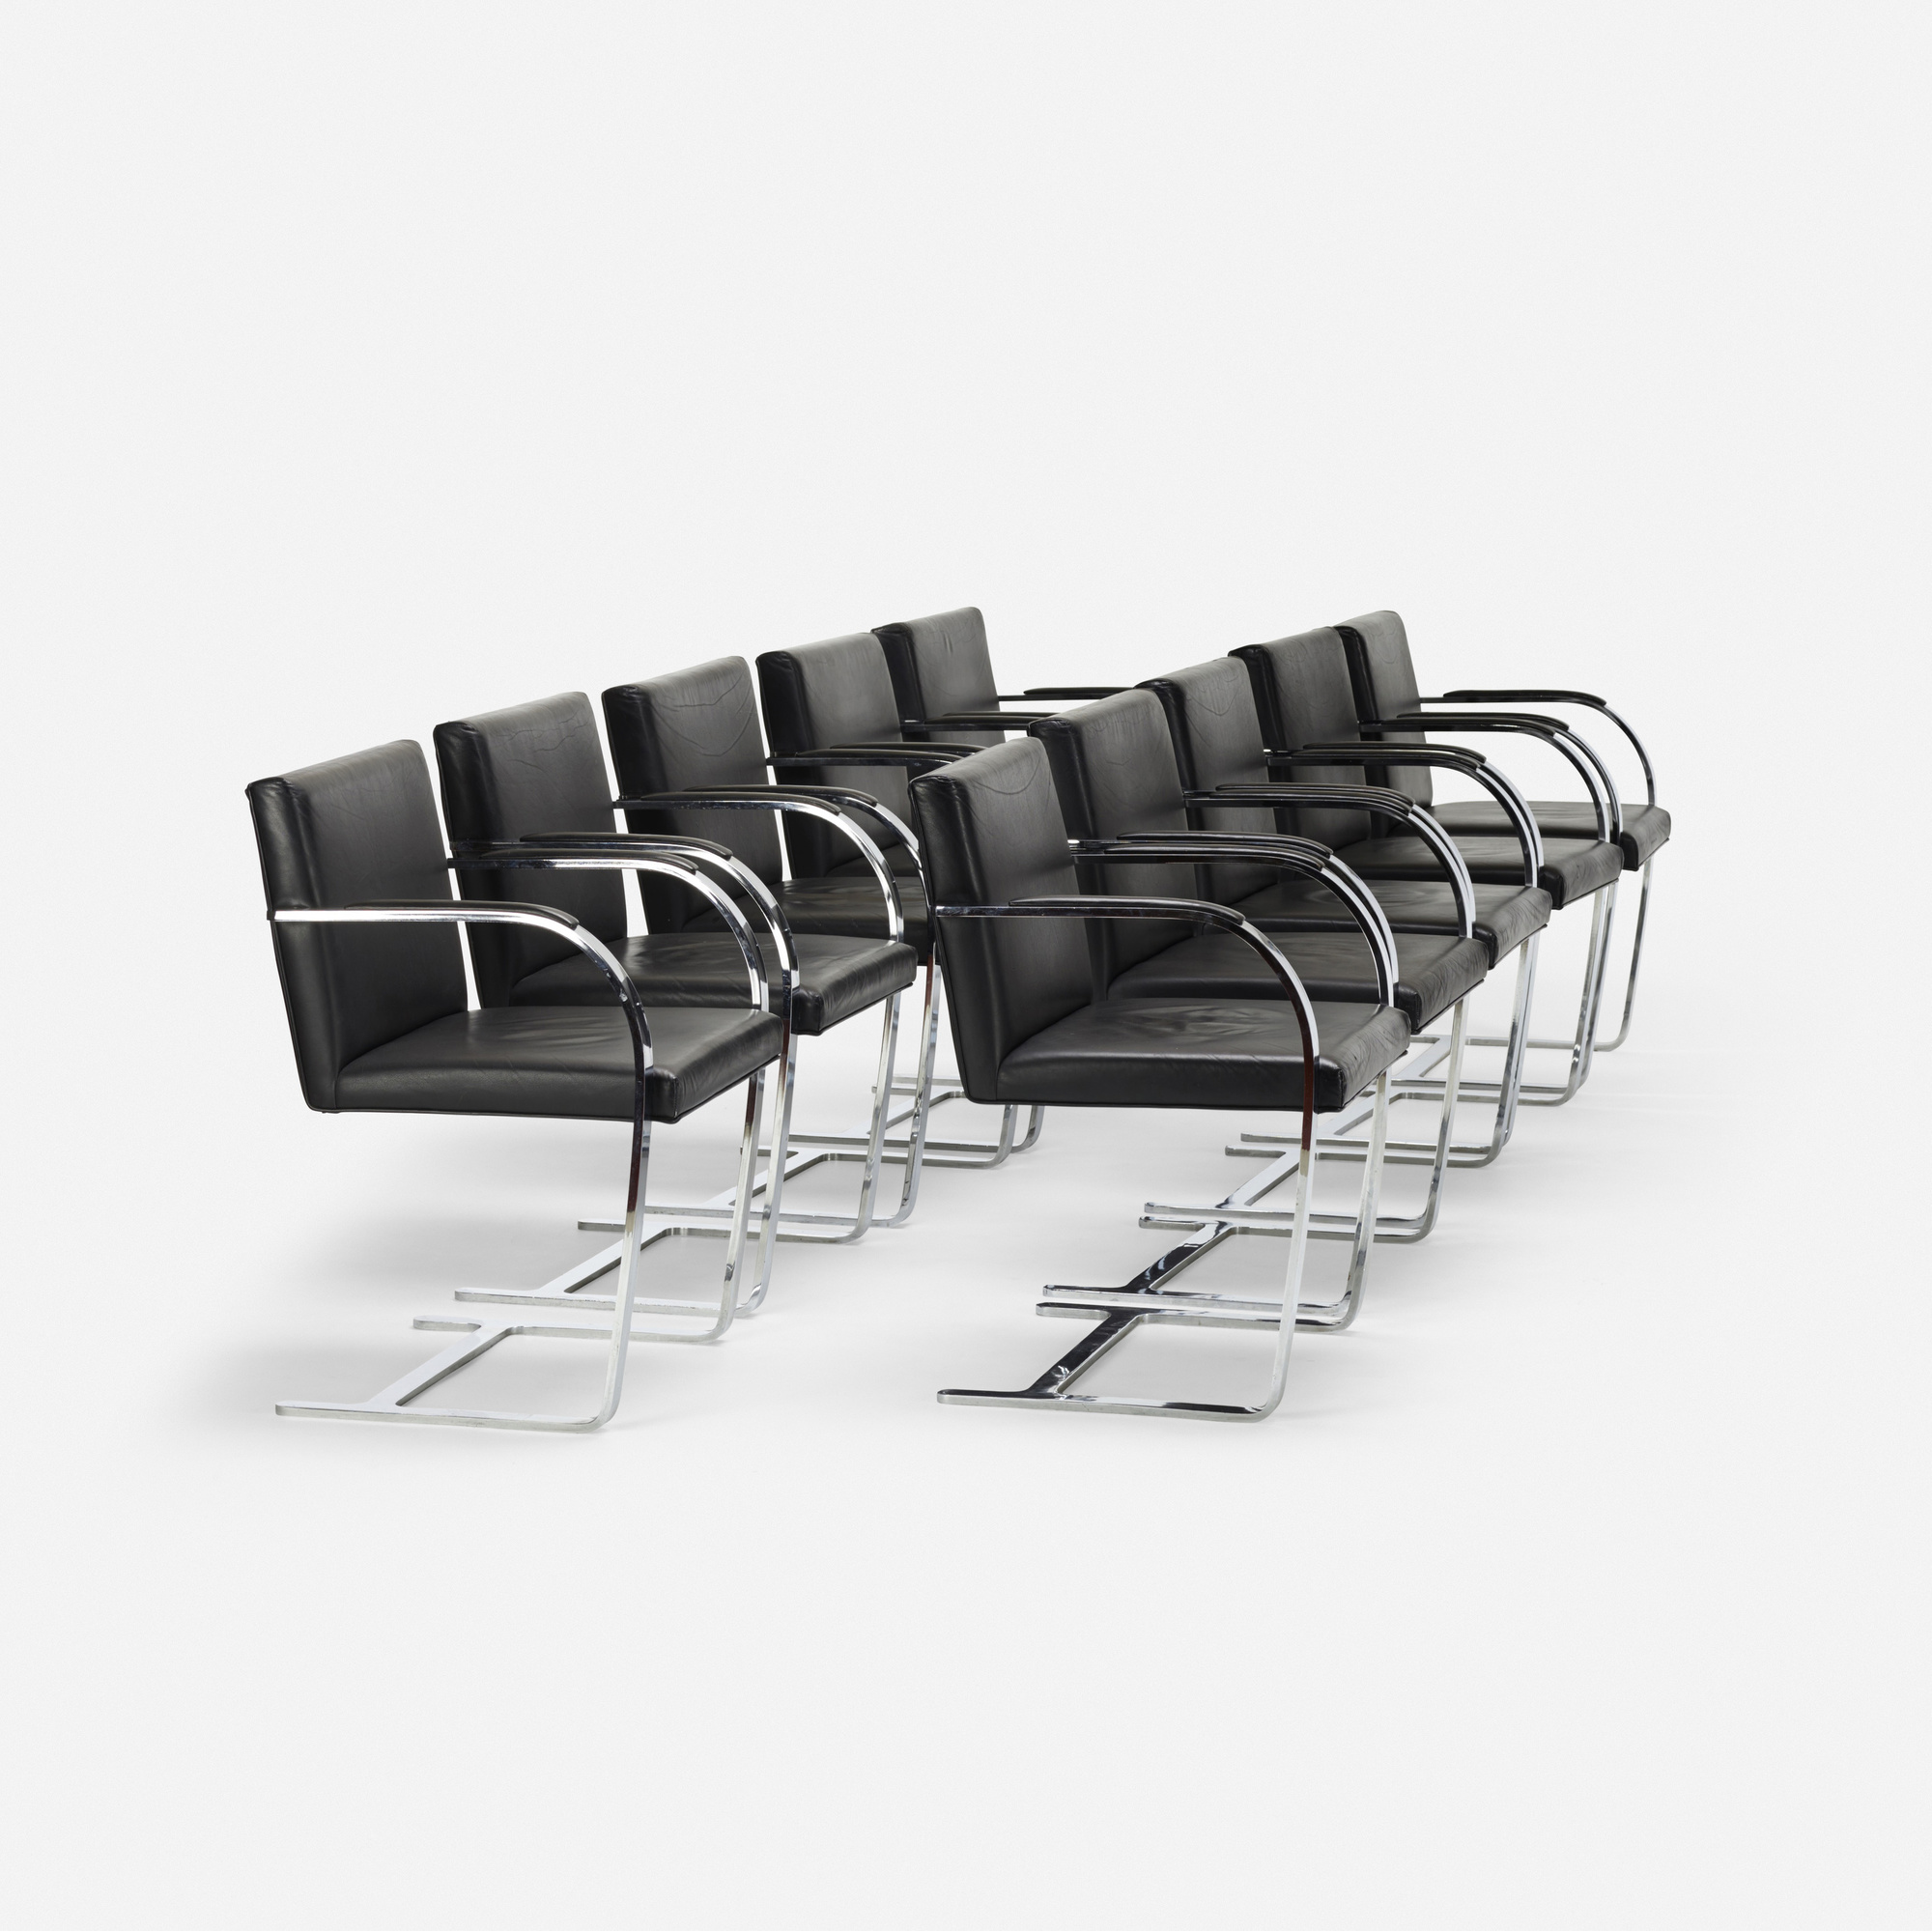 571 Ludwig Mies van der Rohe Brno chairs set of ten Mass